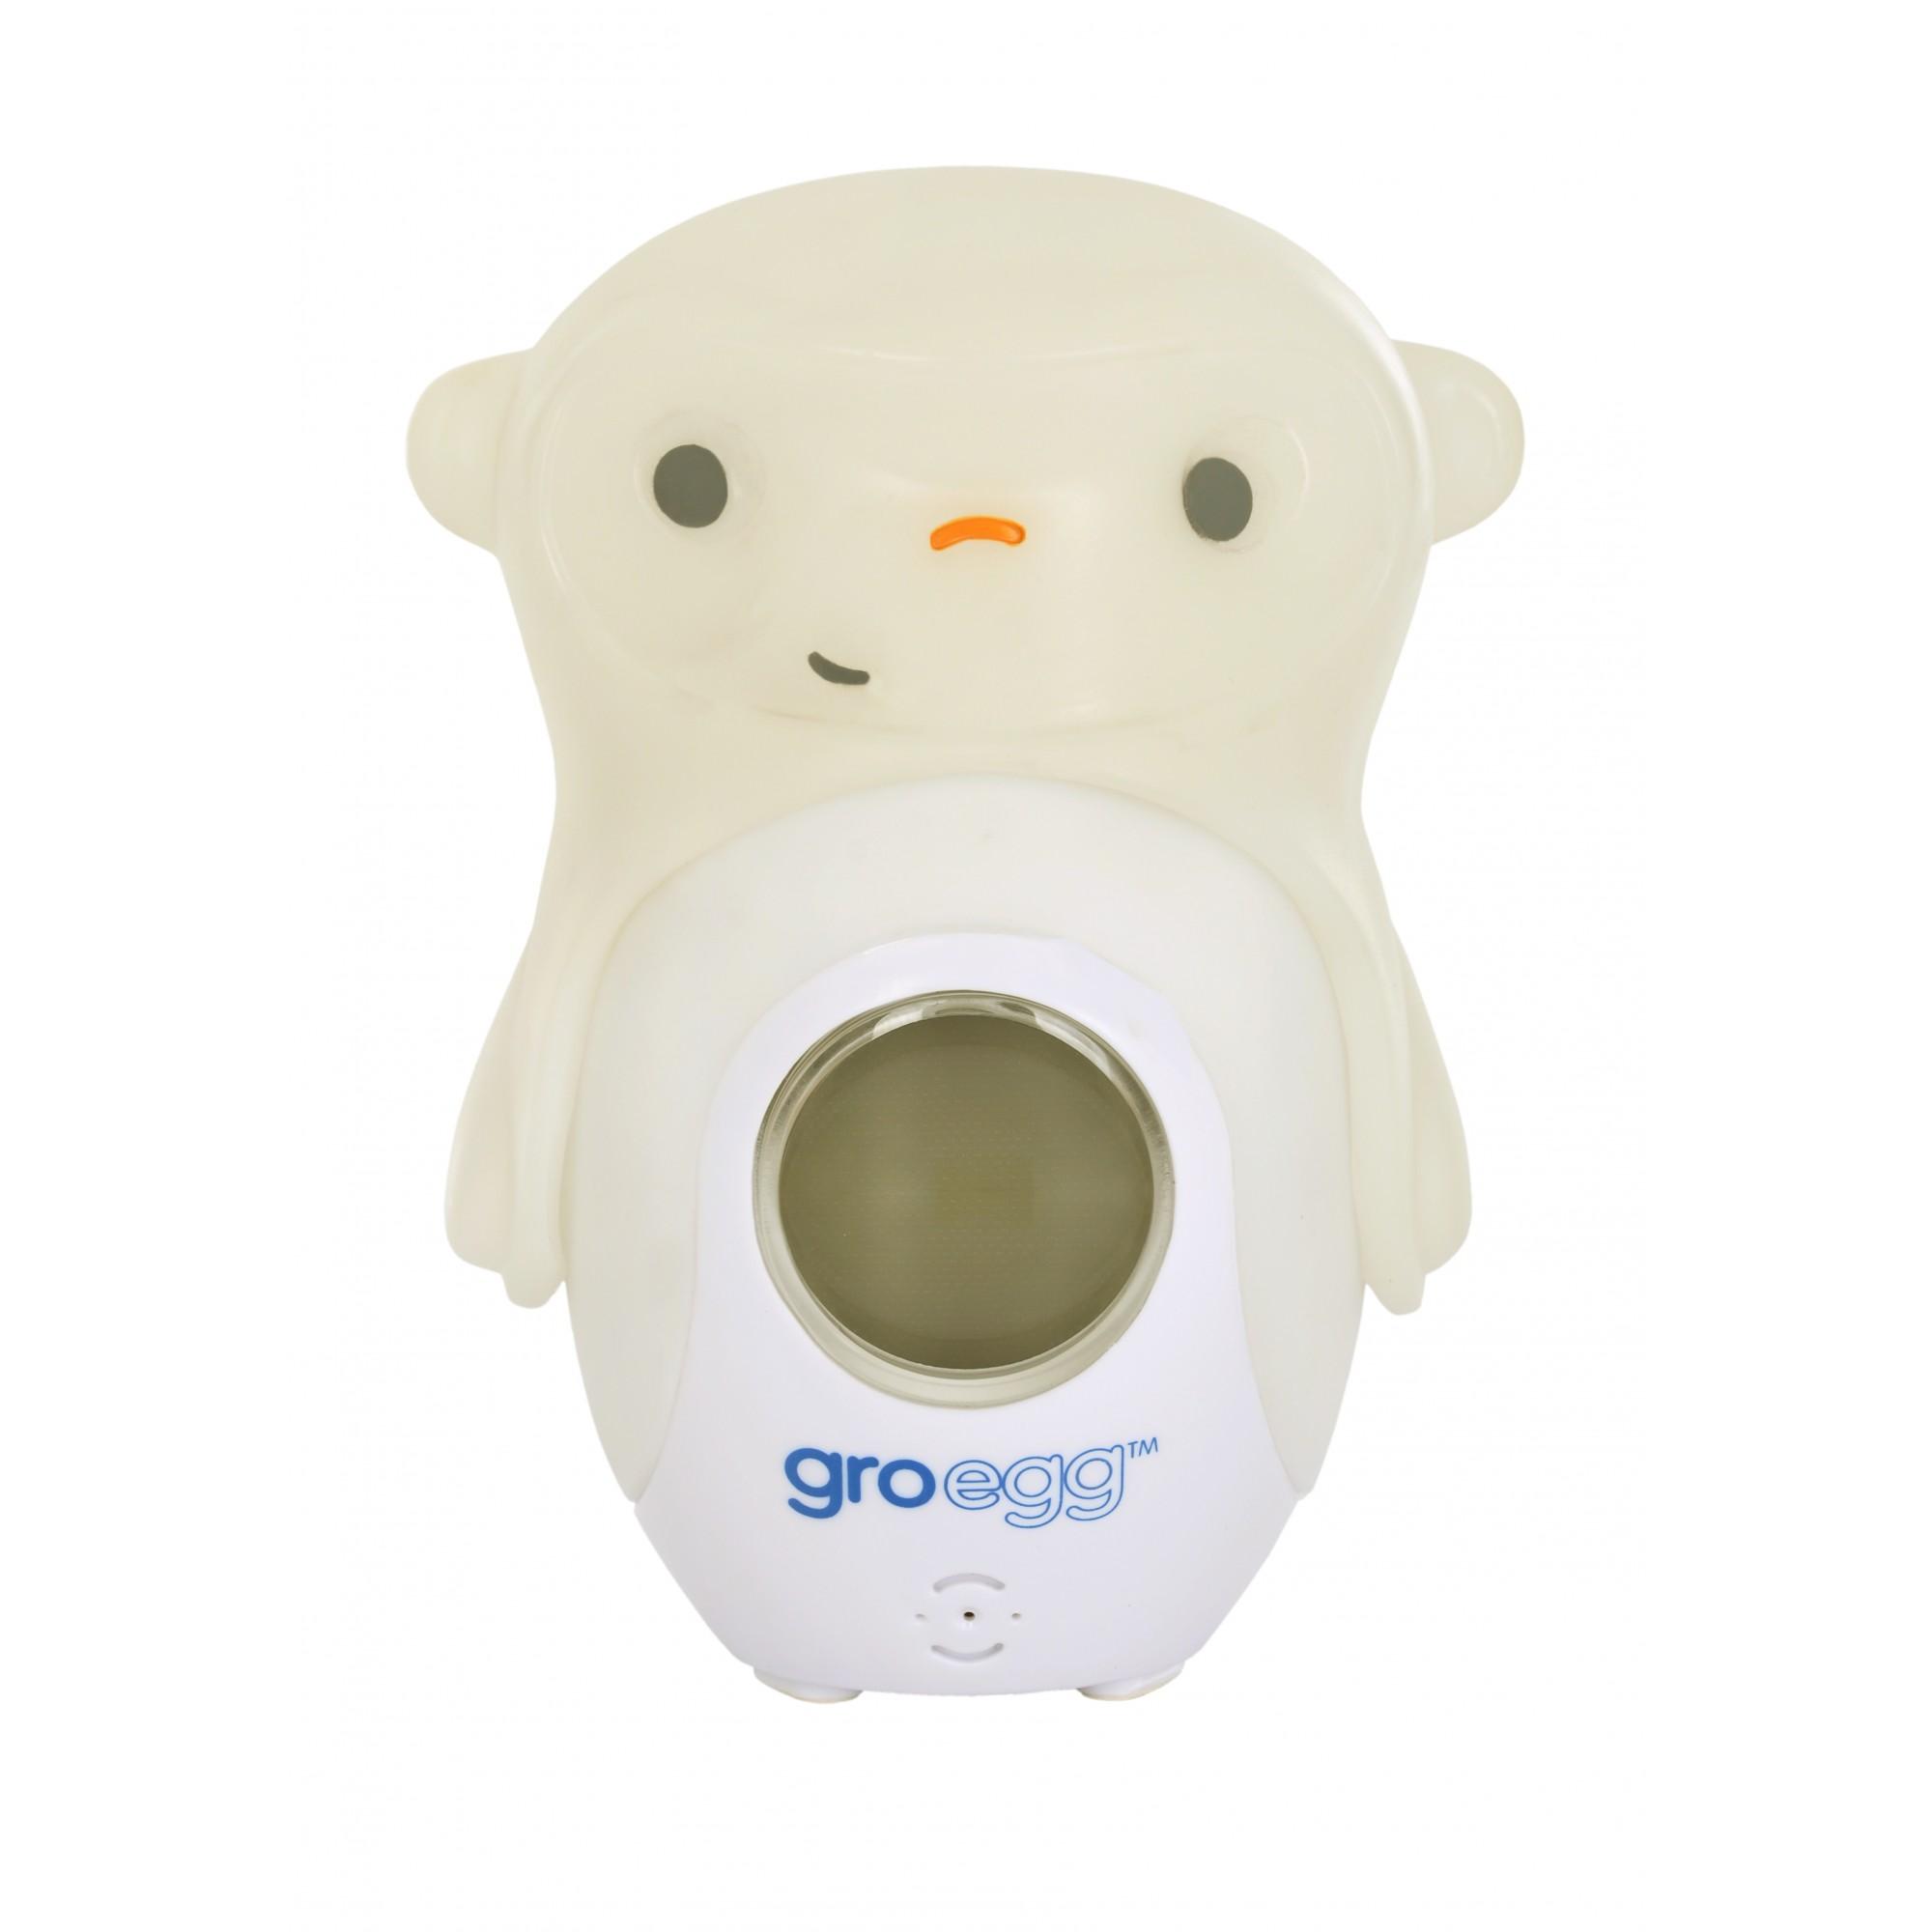 Husa pentru Termometru lampa cu USB, Maimutica Mikey, Gro